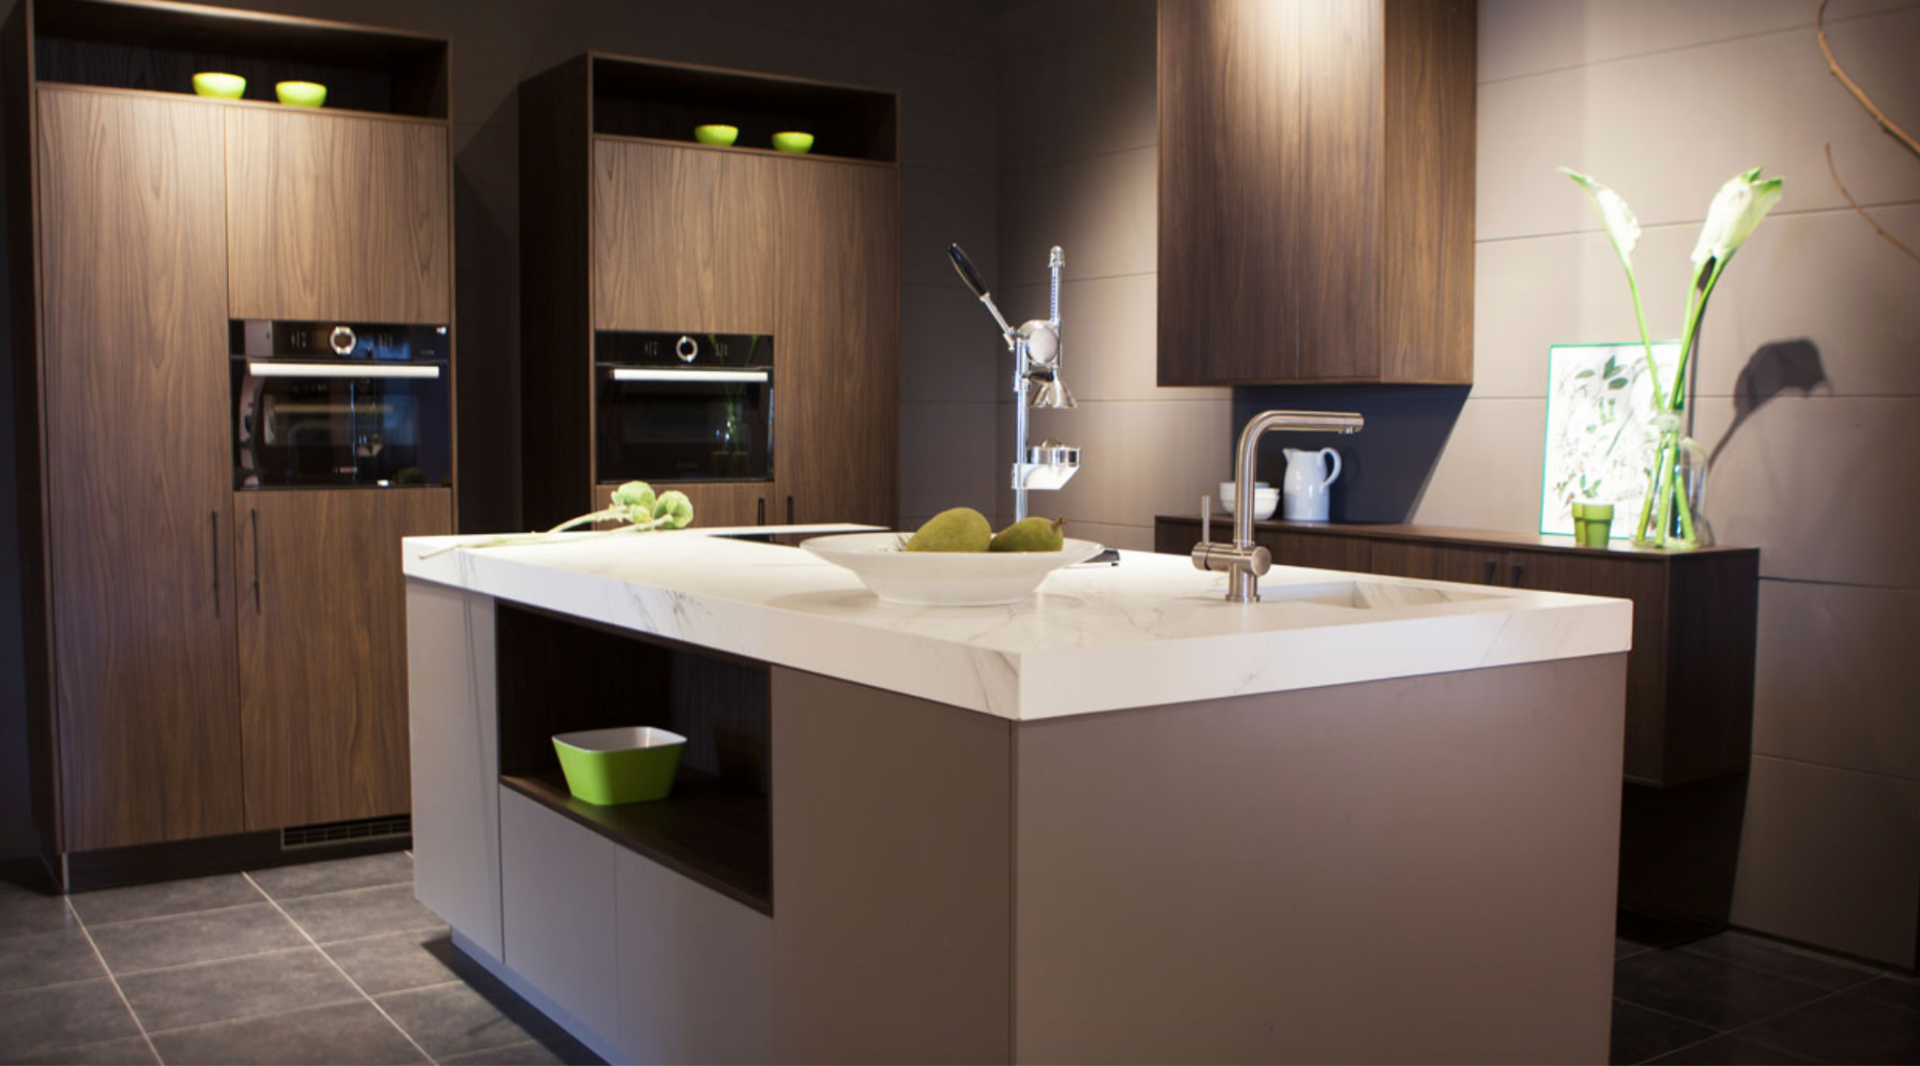 Multi Keukens Maassluis : Keukenstudio maassluis ervaringen keukenstudio maassluis